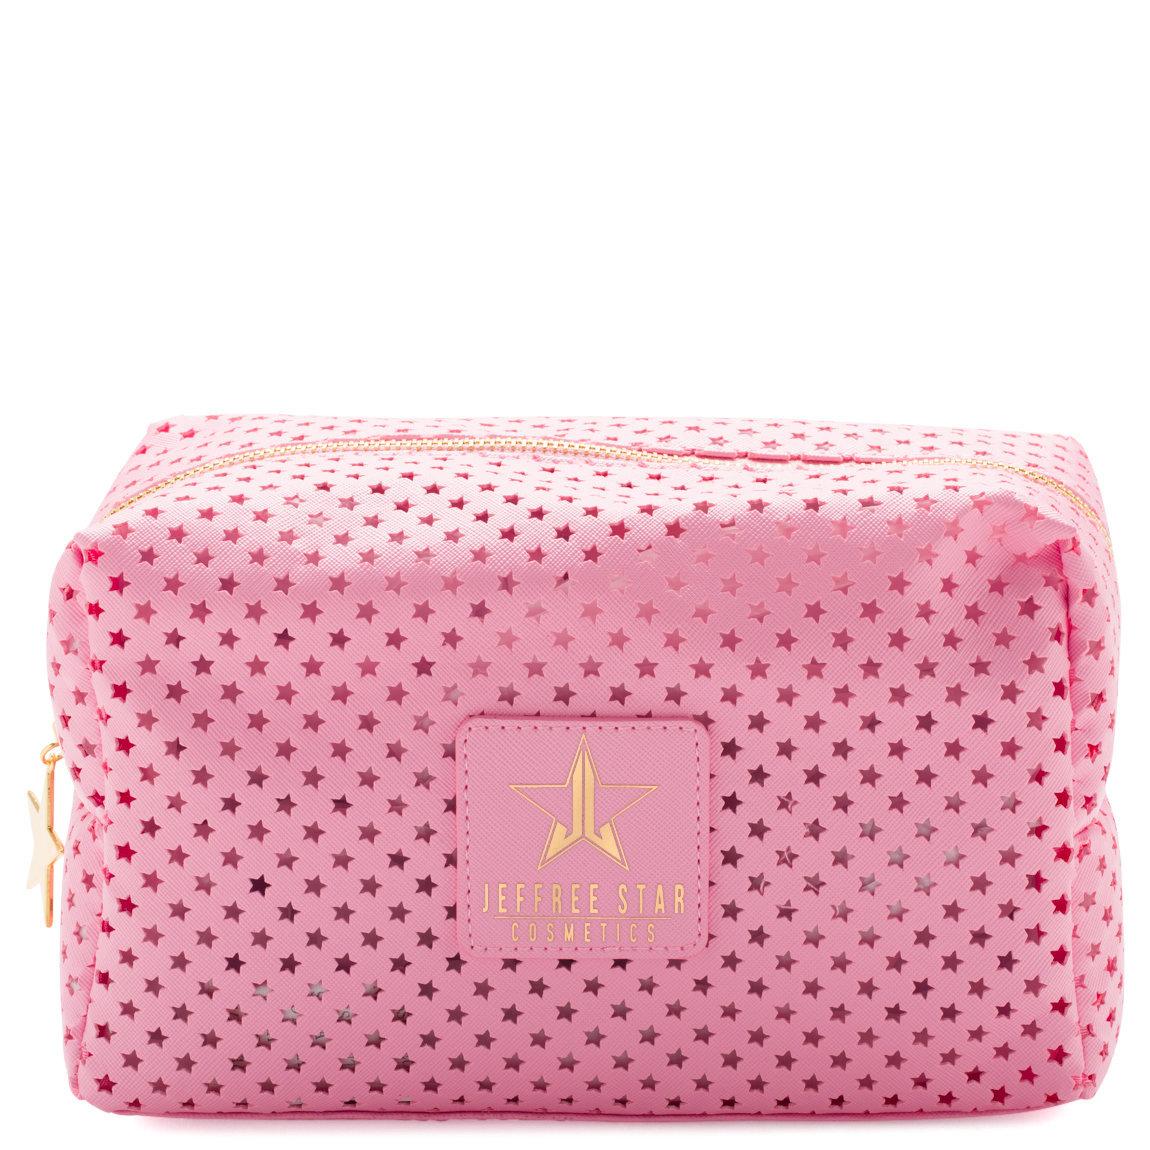 Jeffree Star Cosmetics Star Mesh Makeup Bag product swatch.